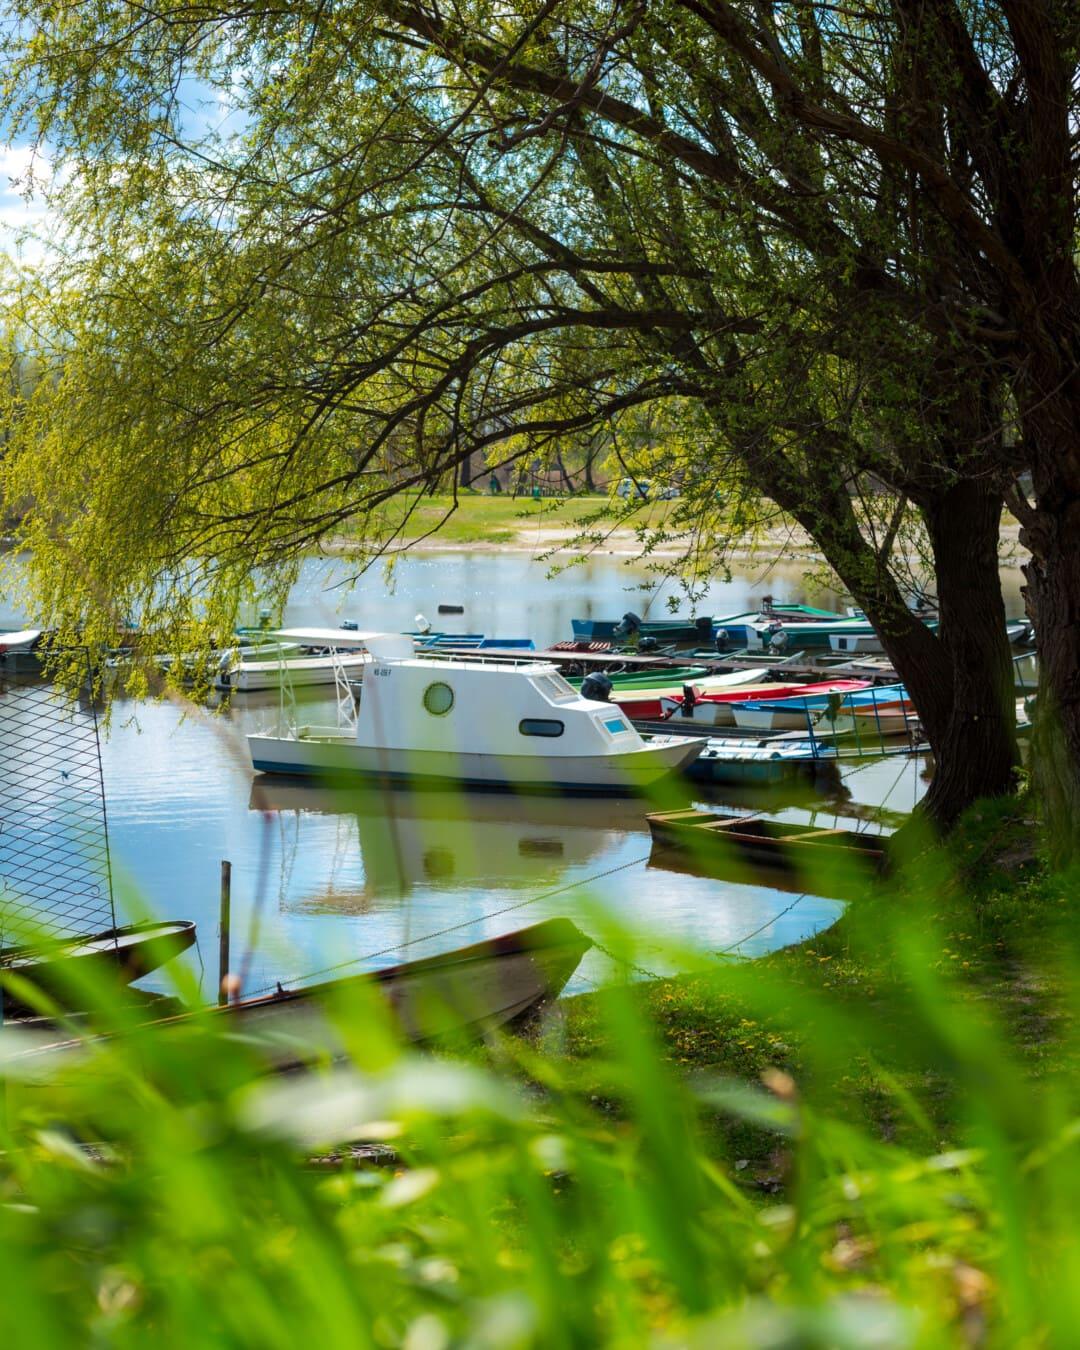 river boat, motorboat, boats, yacht, riverbank, tree, shadow, water, camper, lake